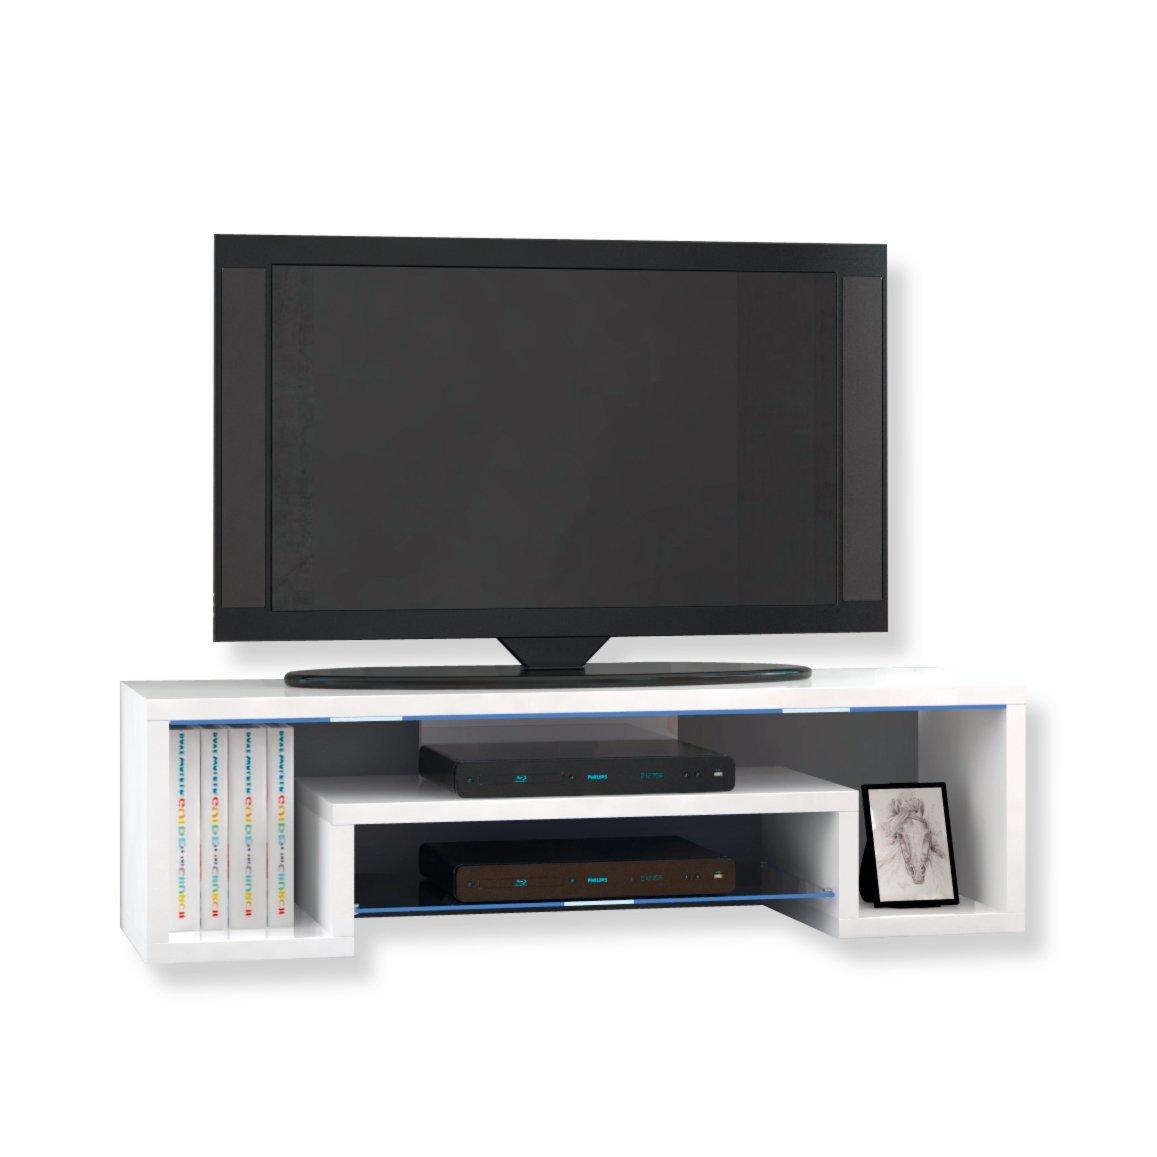 lowboard cara wei hochglanz 136 cm tv lowboards tv b nke tv hifi m bel m bel. Black Bedroom Furniture Sets. Home Design Ideas